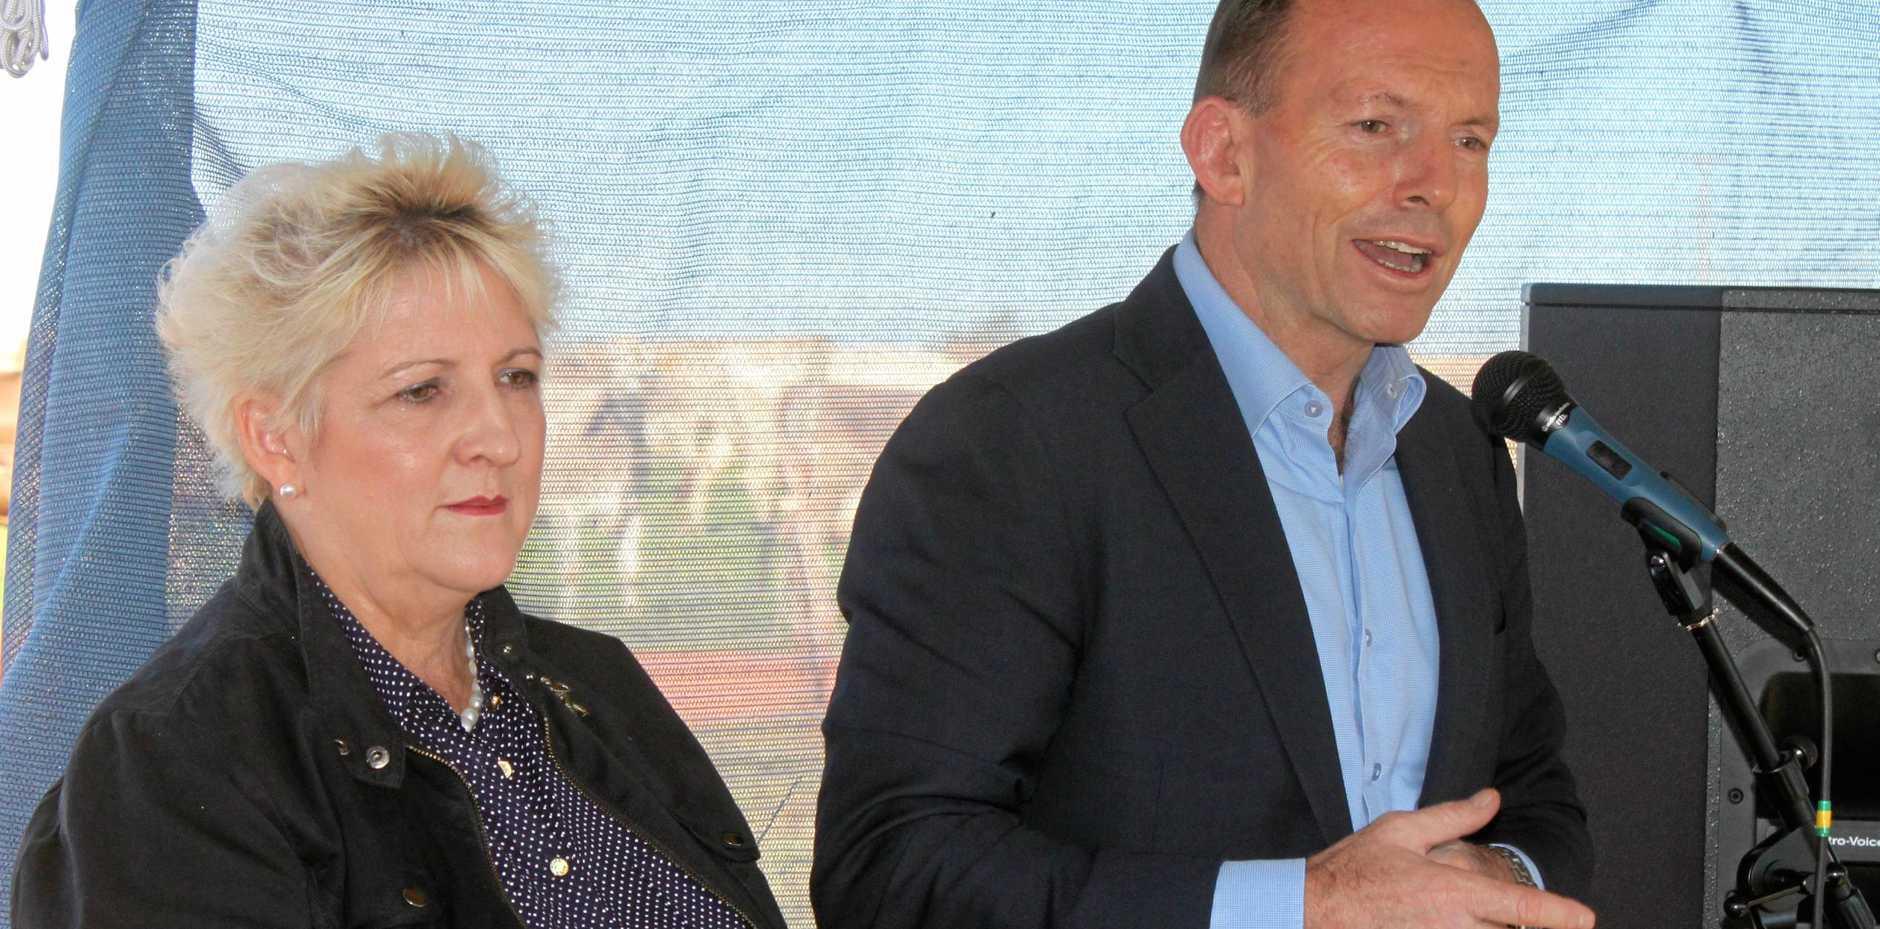 REVENGE PLOT: Capricornia MP Michelle Landry accused former PM Tony Abbott of orchestrating a revenge campaign.